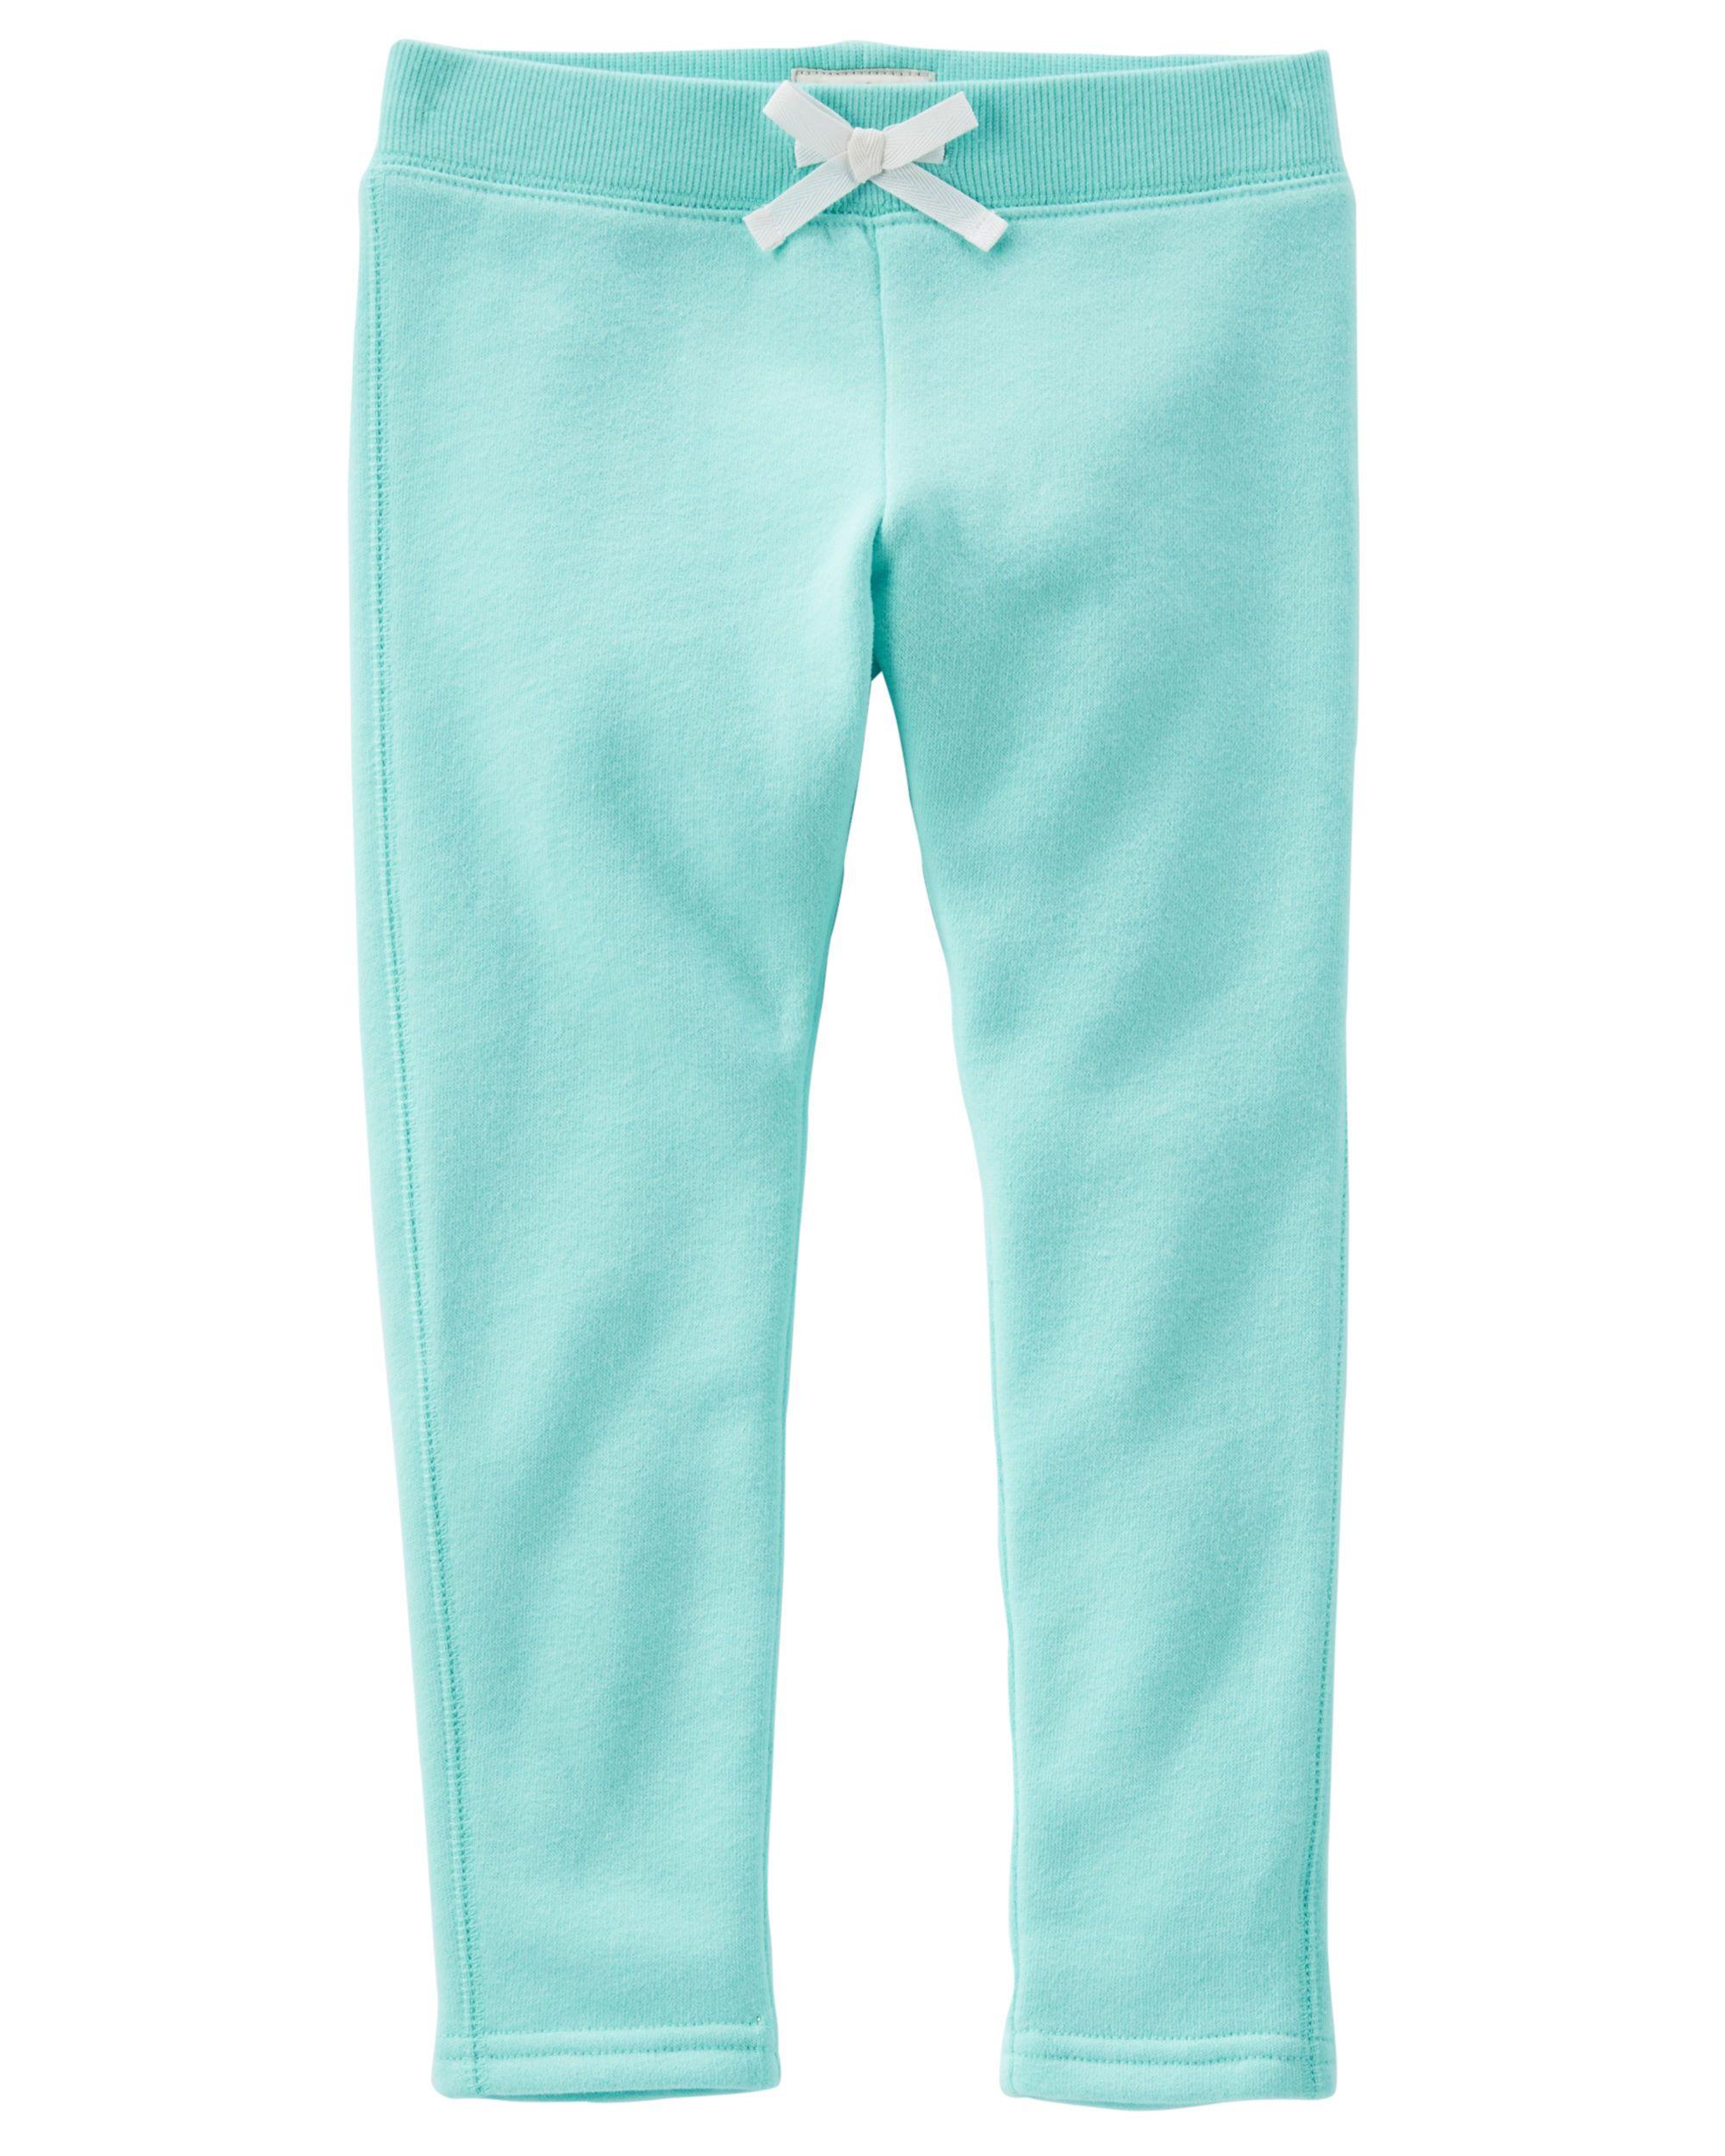 Coral NWT OshKosh B/'Gosh Toddler Girls/' Neon Skinny Sweats Pants